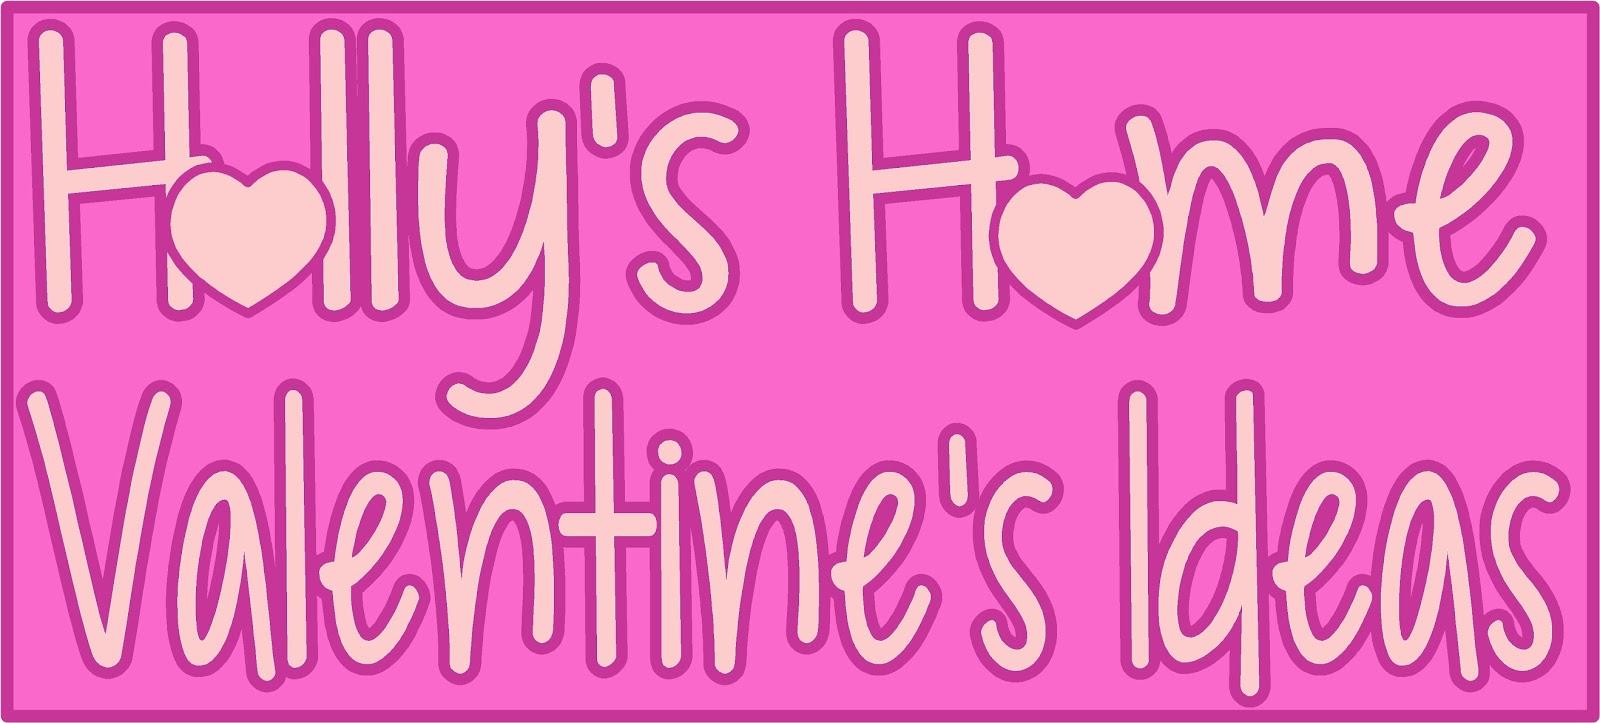 http://hollyshome-hollyshome.blogspot.com/p/fun-and-free-valentines-ideas.html